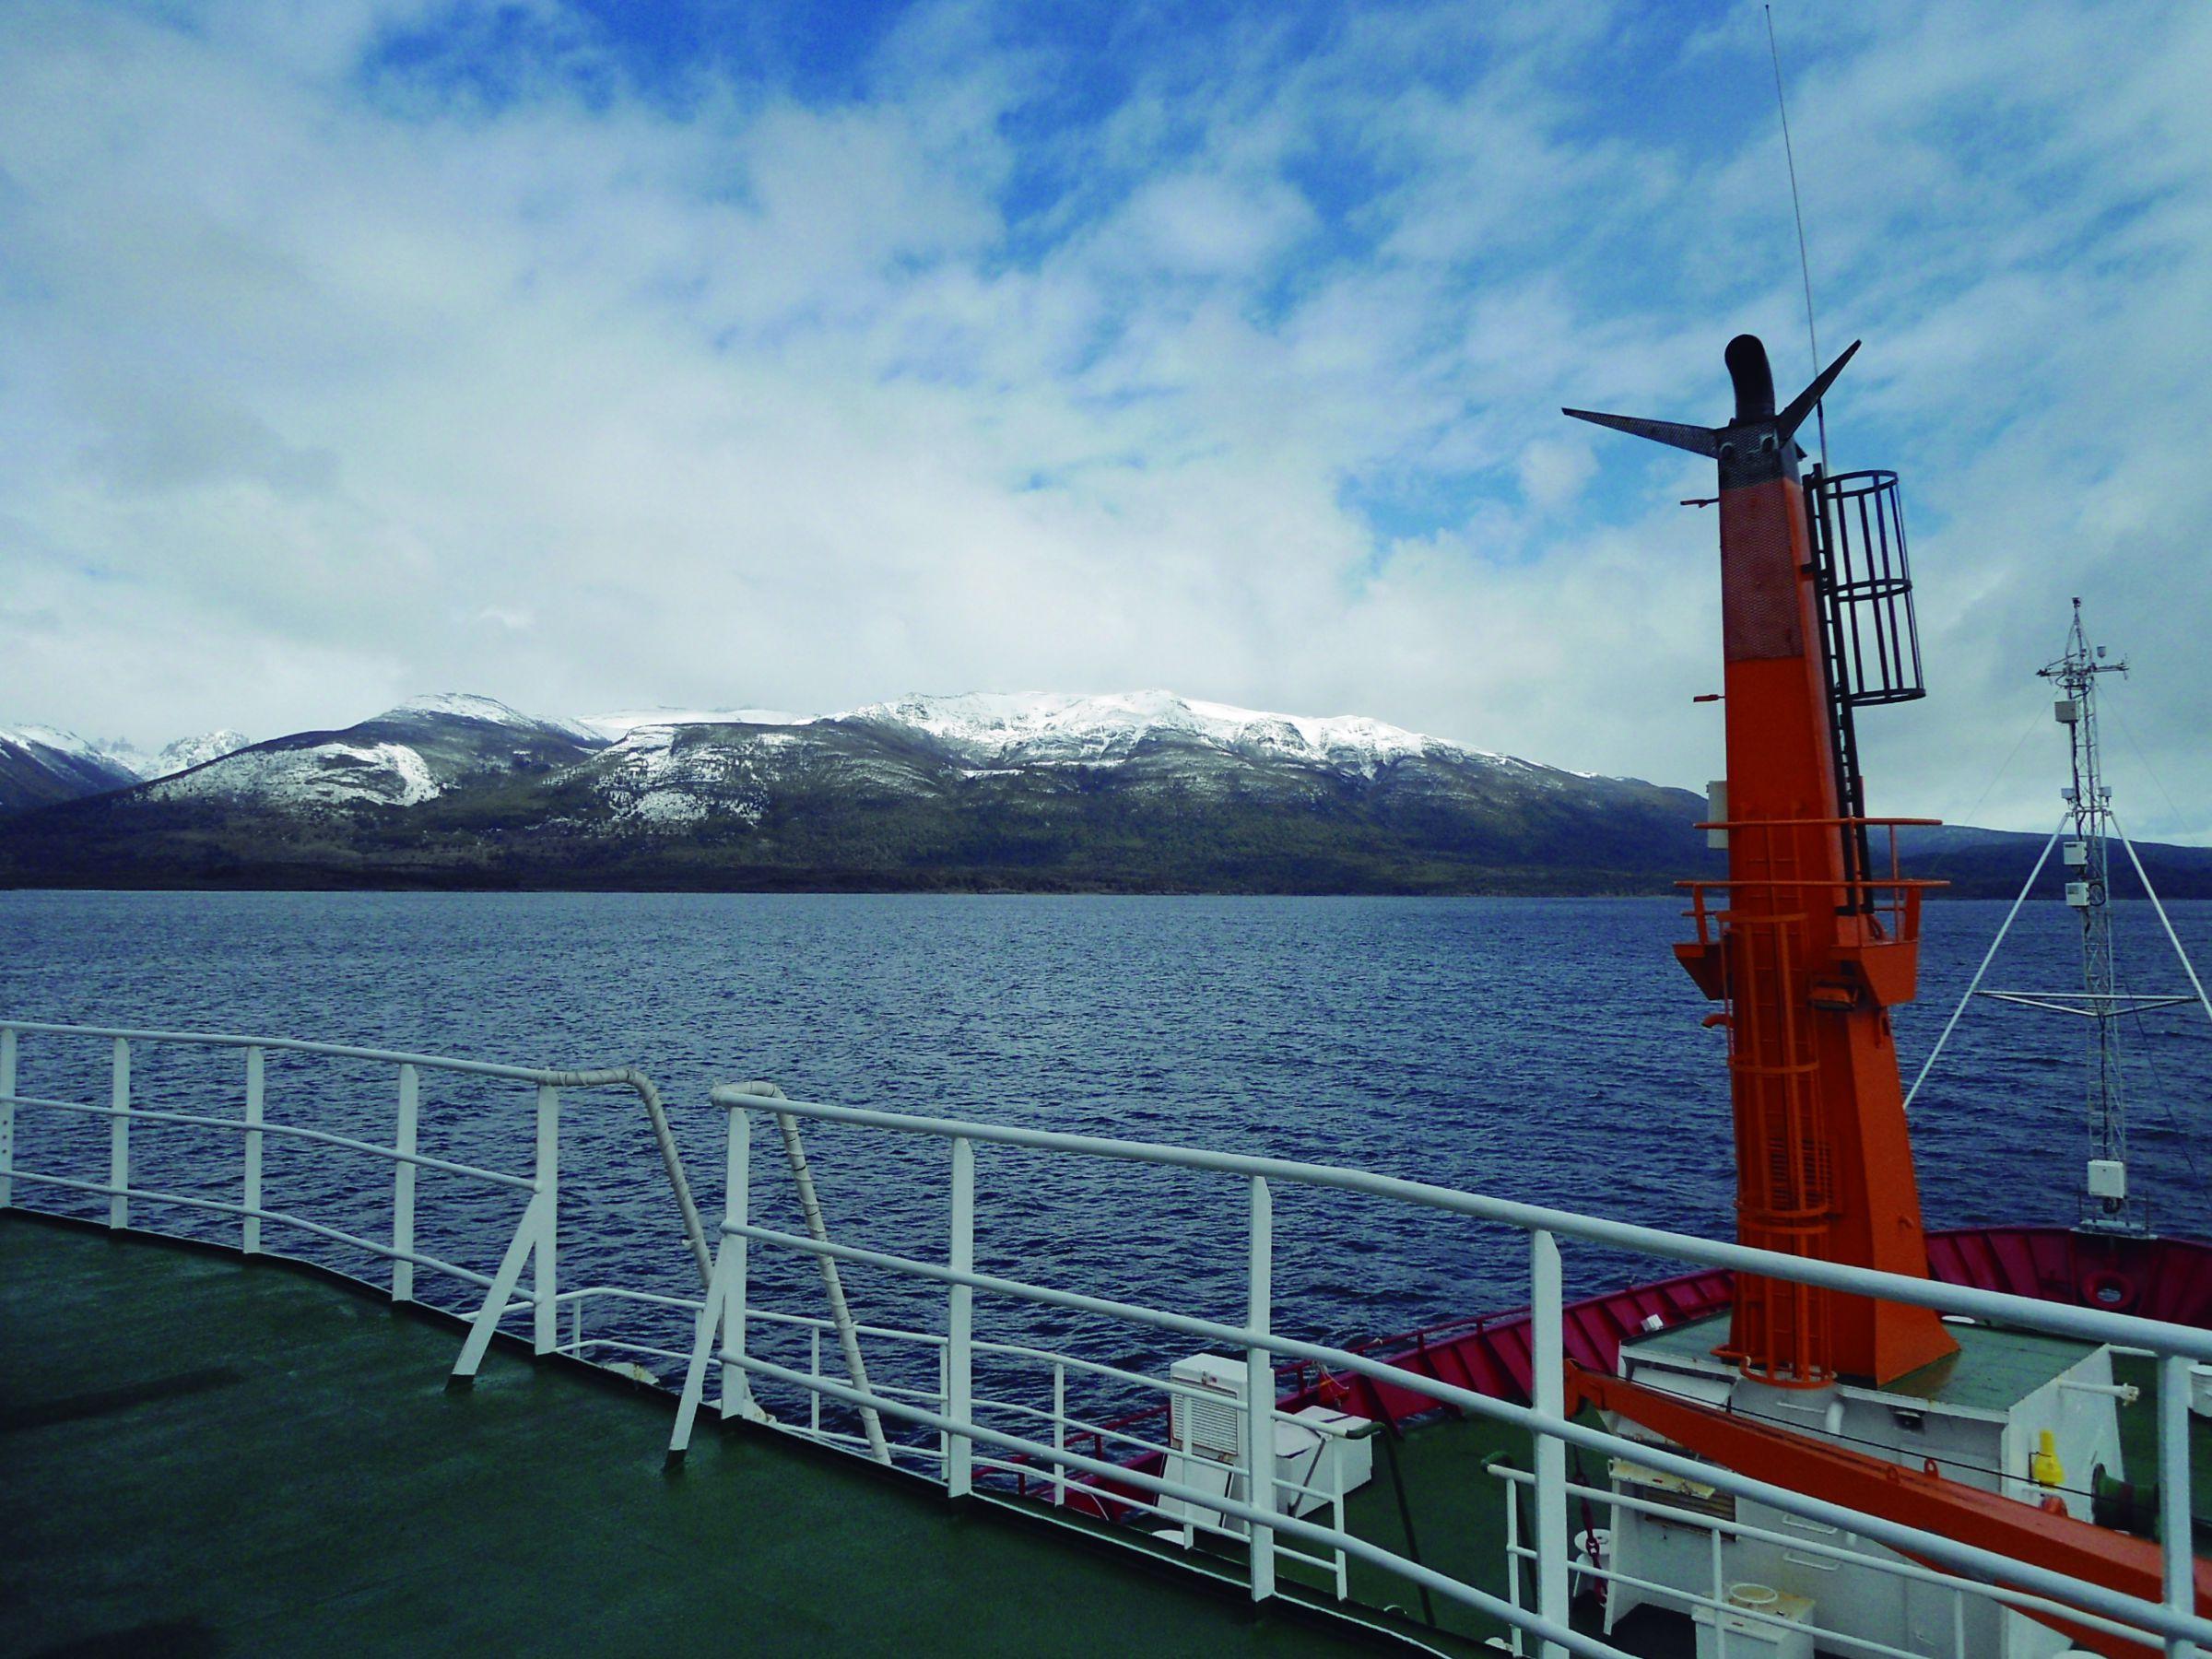 Equipe do Inpe viajou no Navio Polar Almirante Maximiliano à Antártica